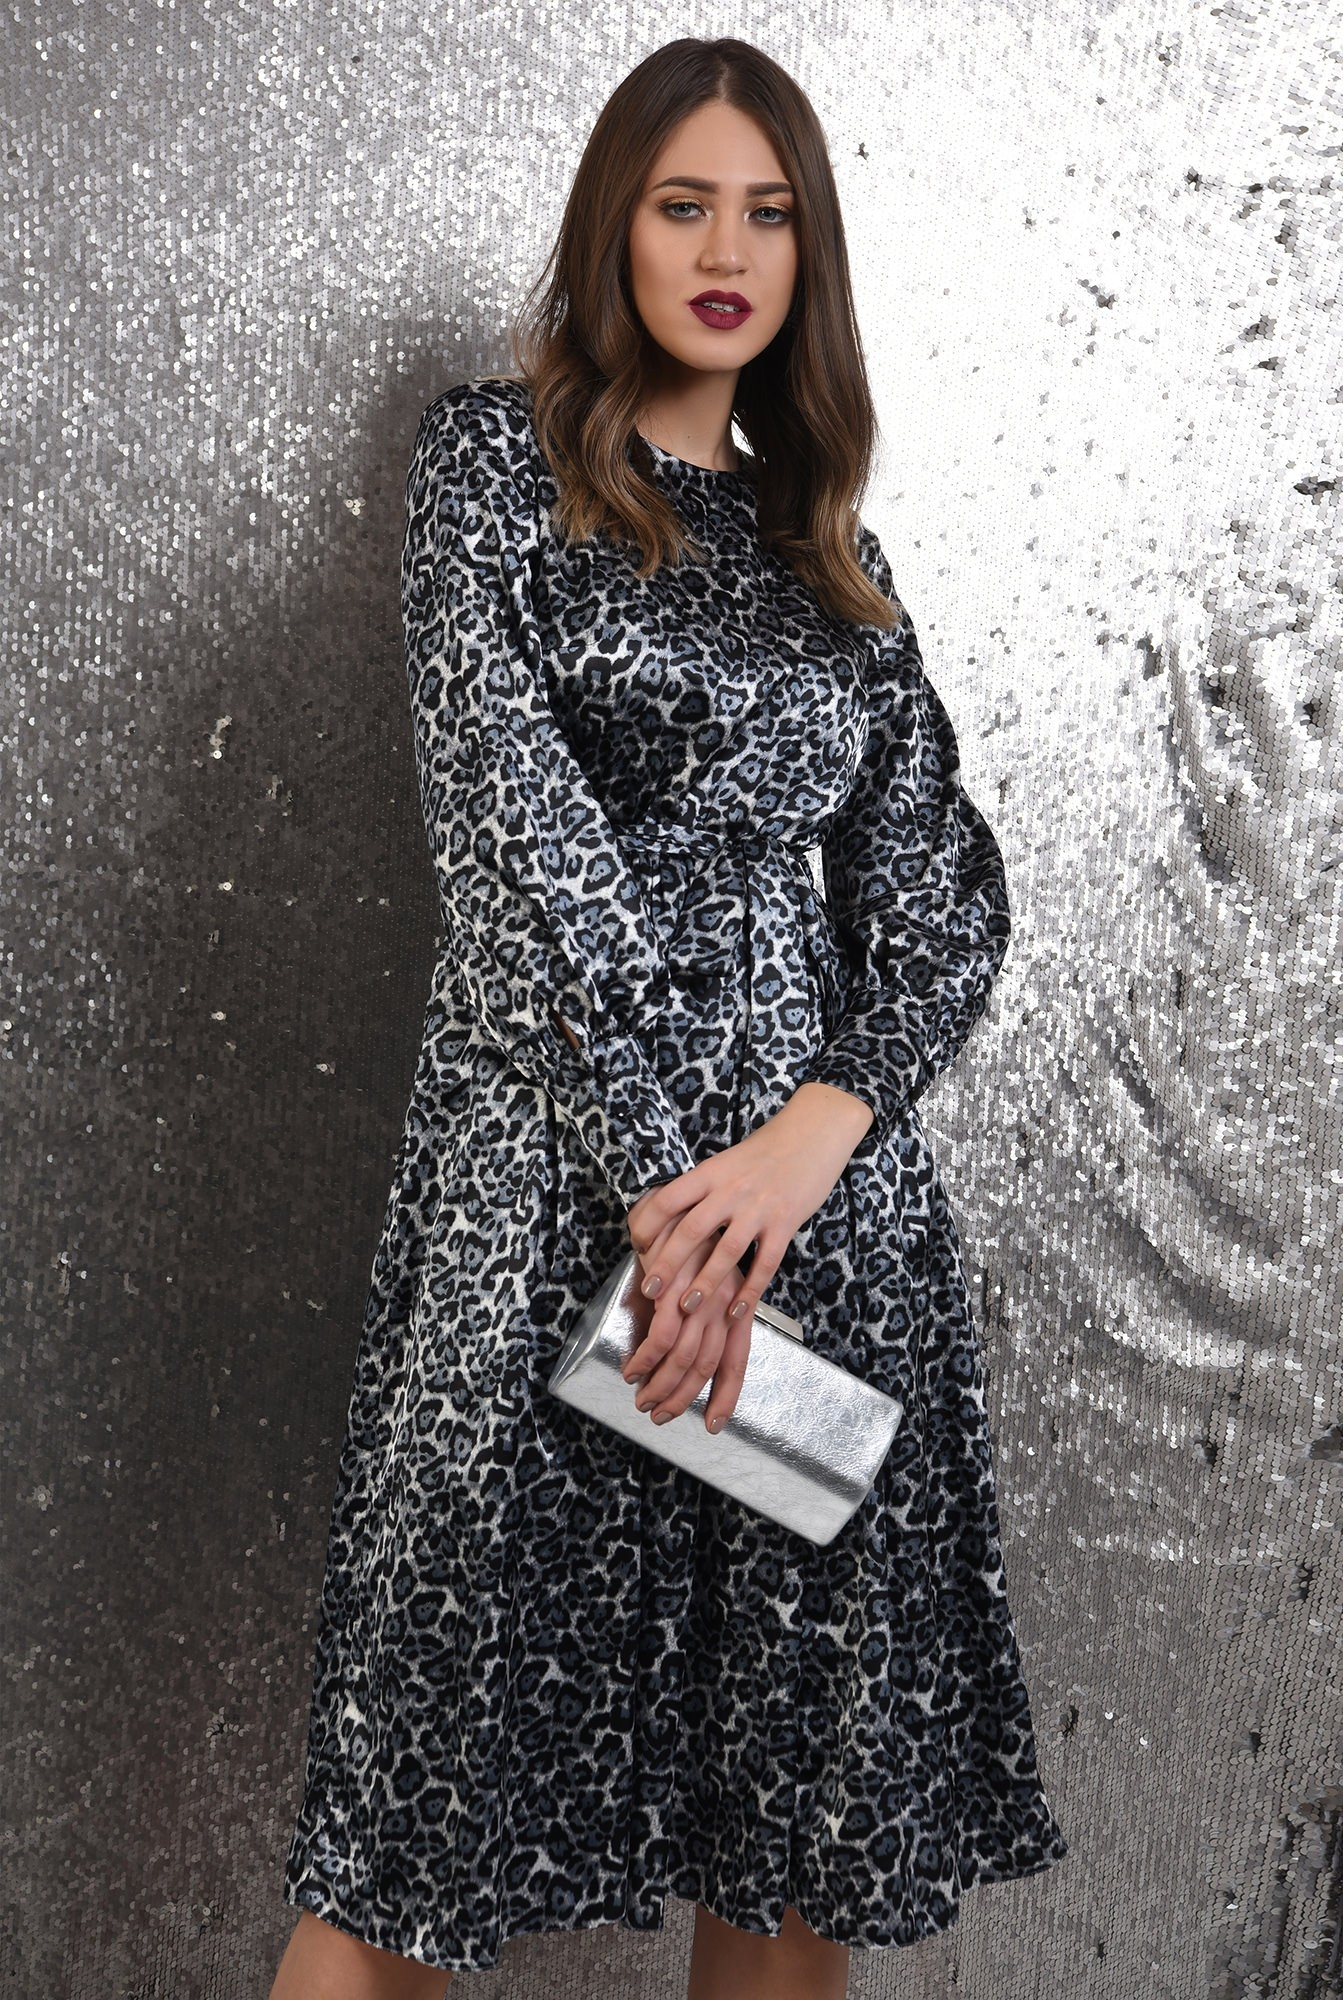 0 - rochie eleganta, din satin, animal print, nasturi la spate, evazata